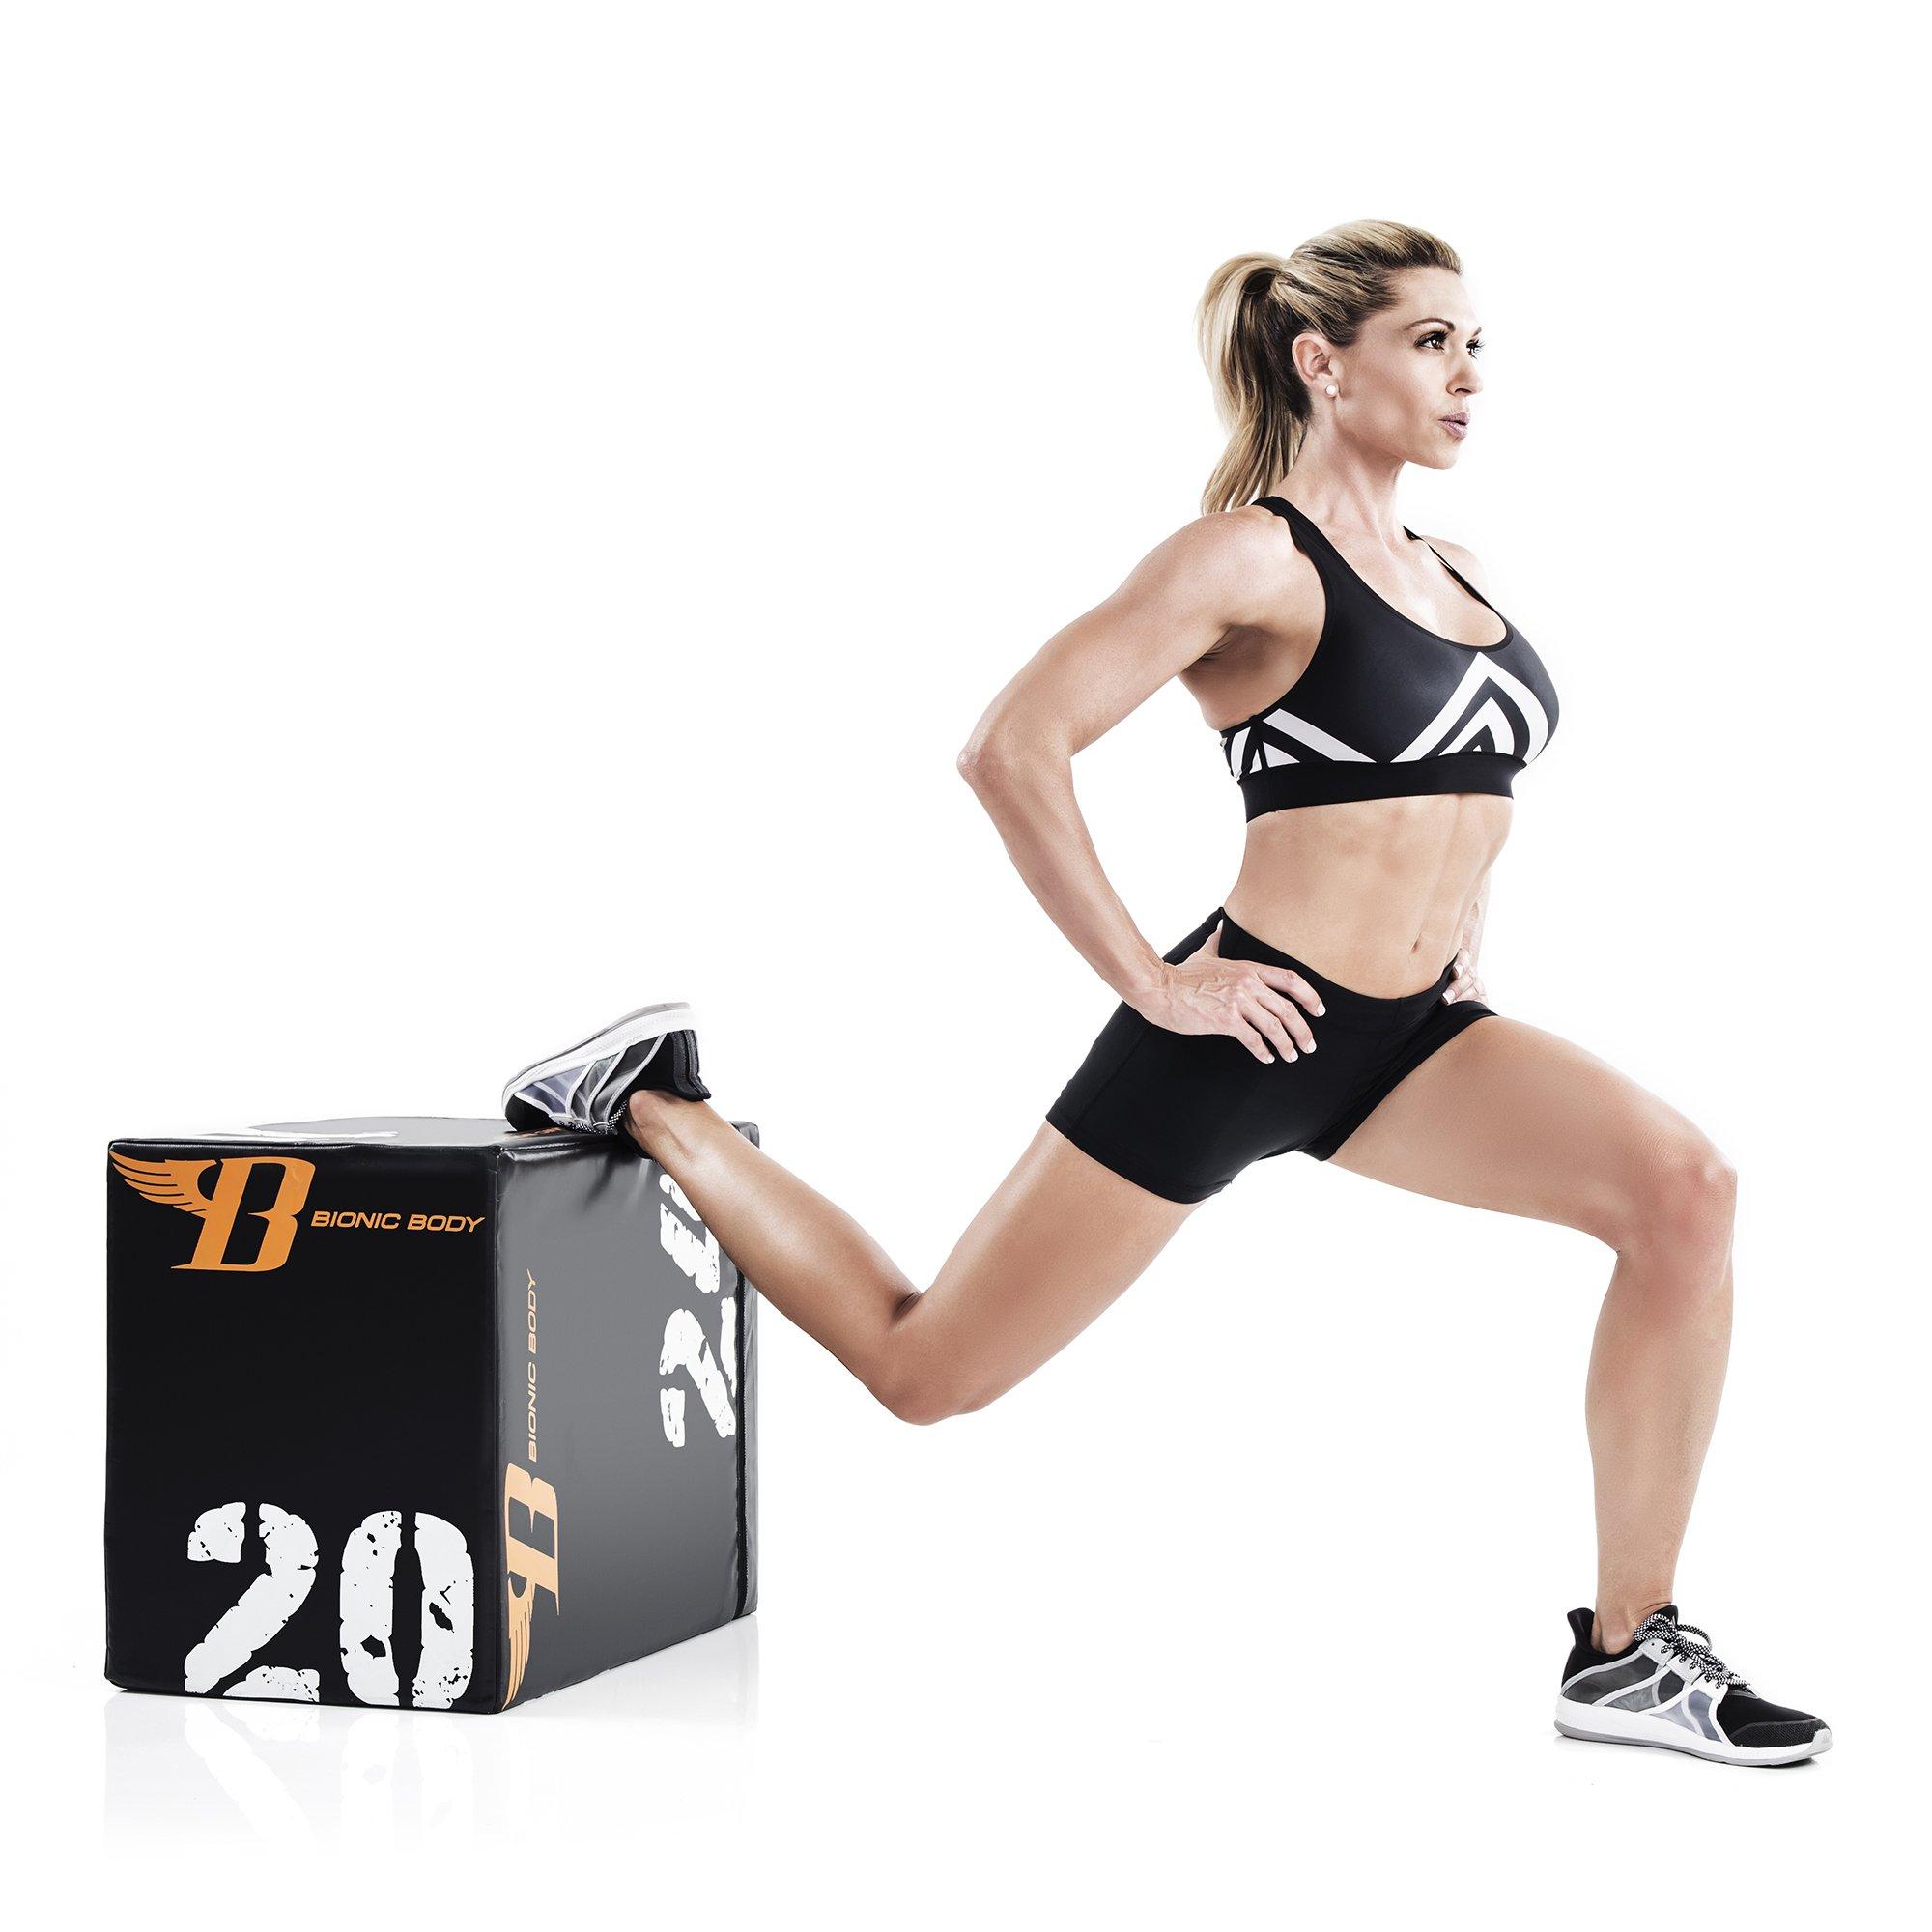 Bionic Body Plyo Exercise Box Plyometric Box with Soft Cover BBPB-1106 by Bionic Body (Image #4)